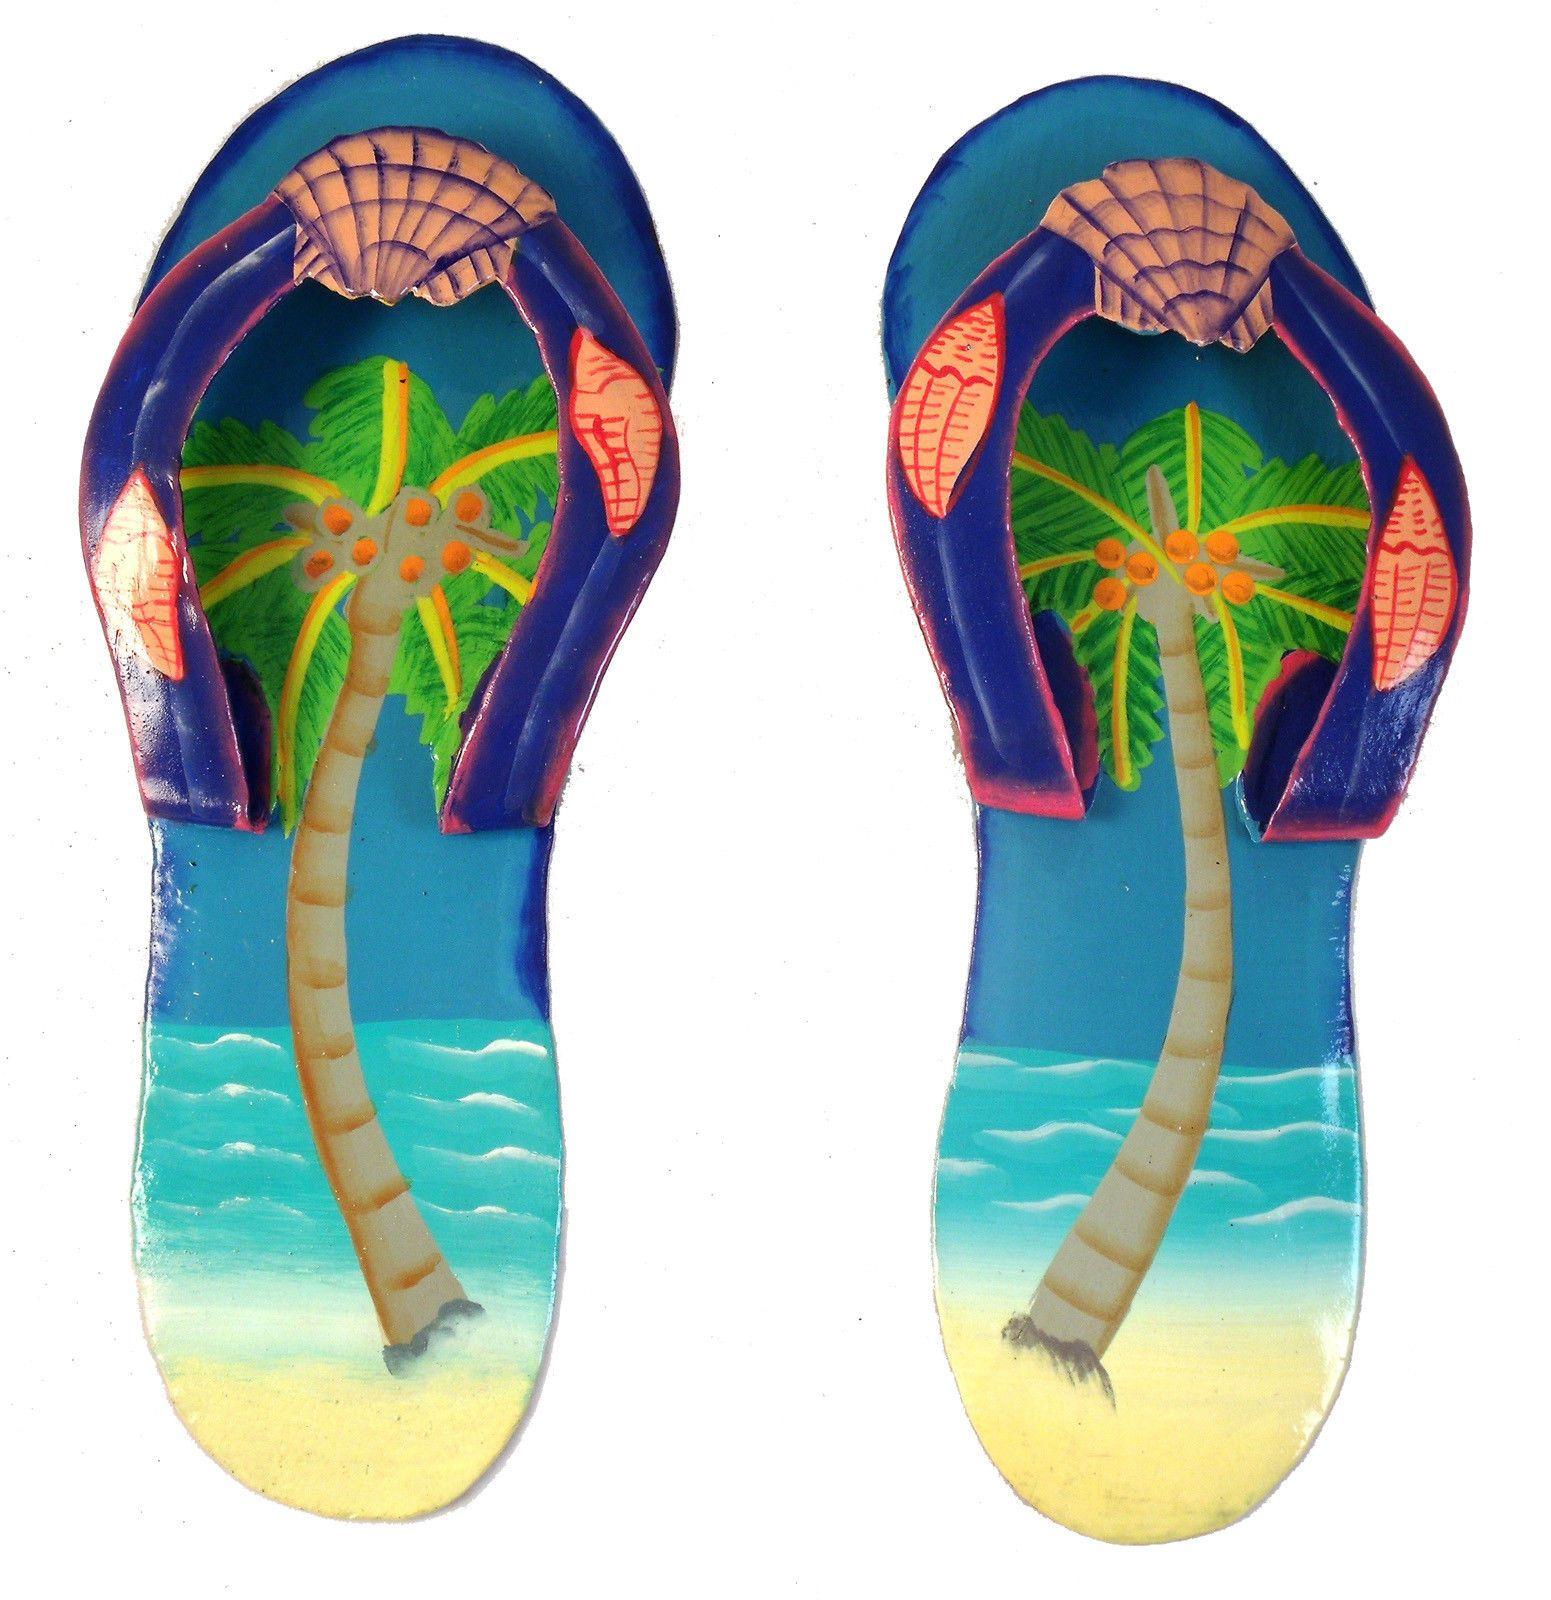 Tropical beach flip flop palm tree hatian metal wall decor set